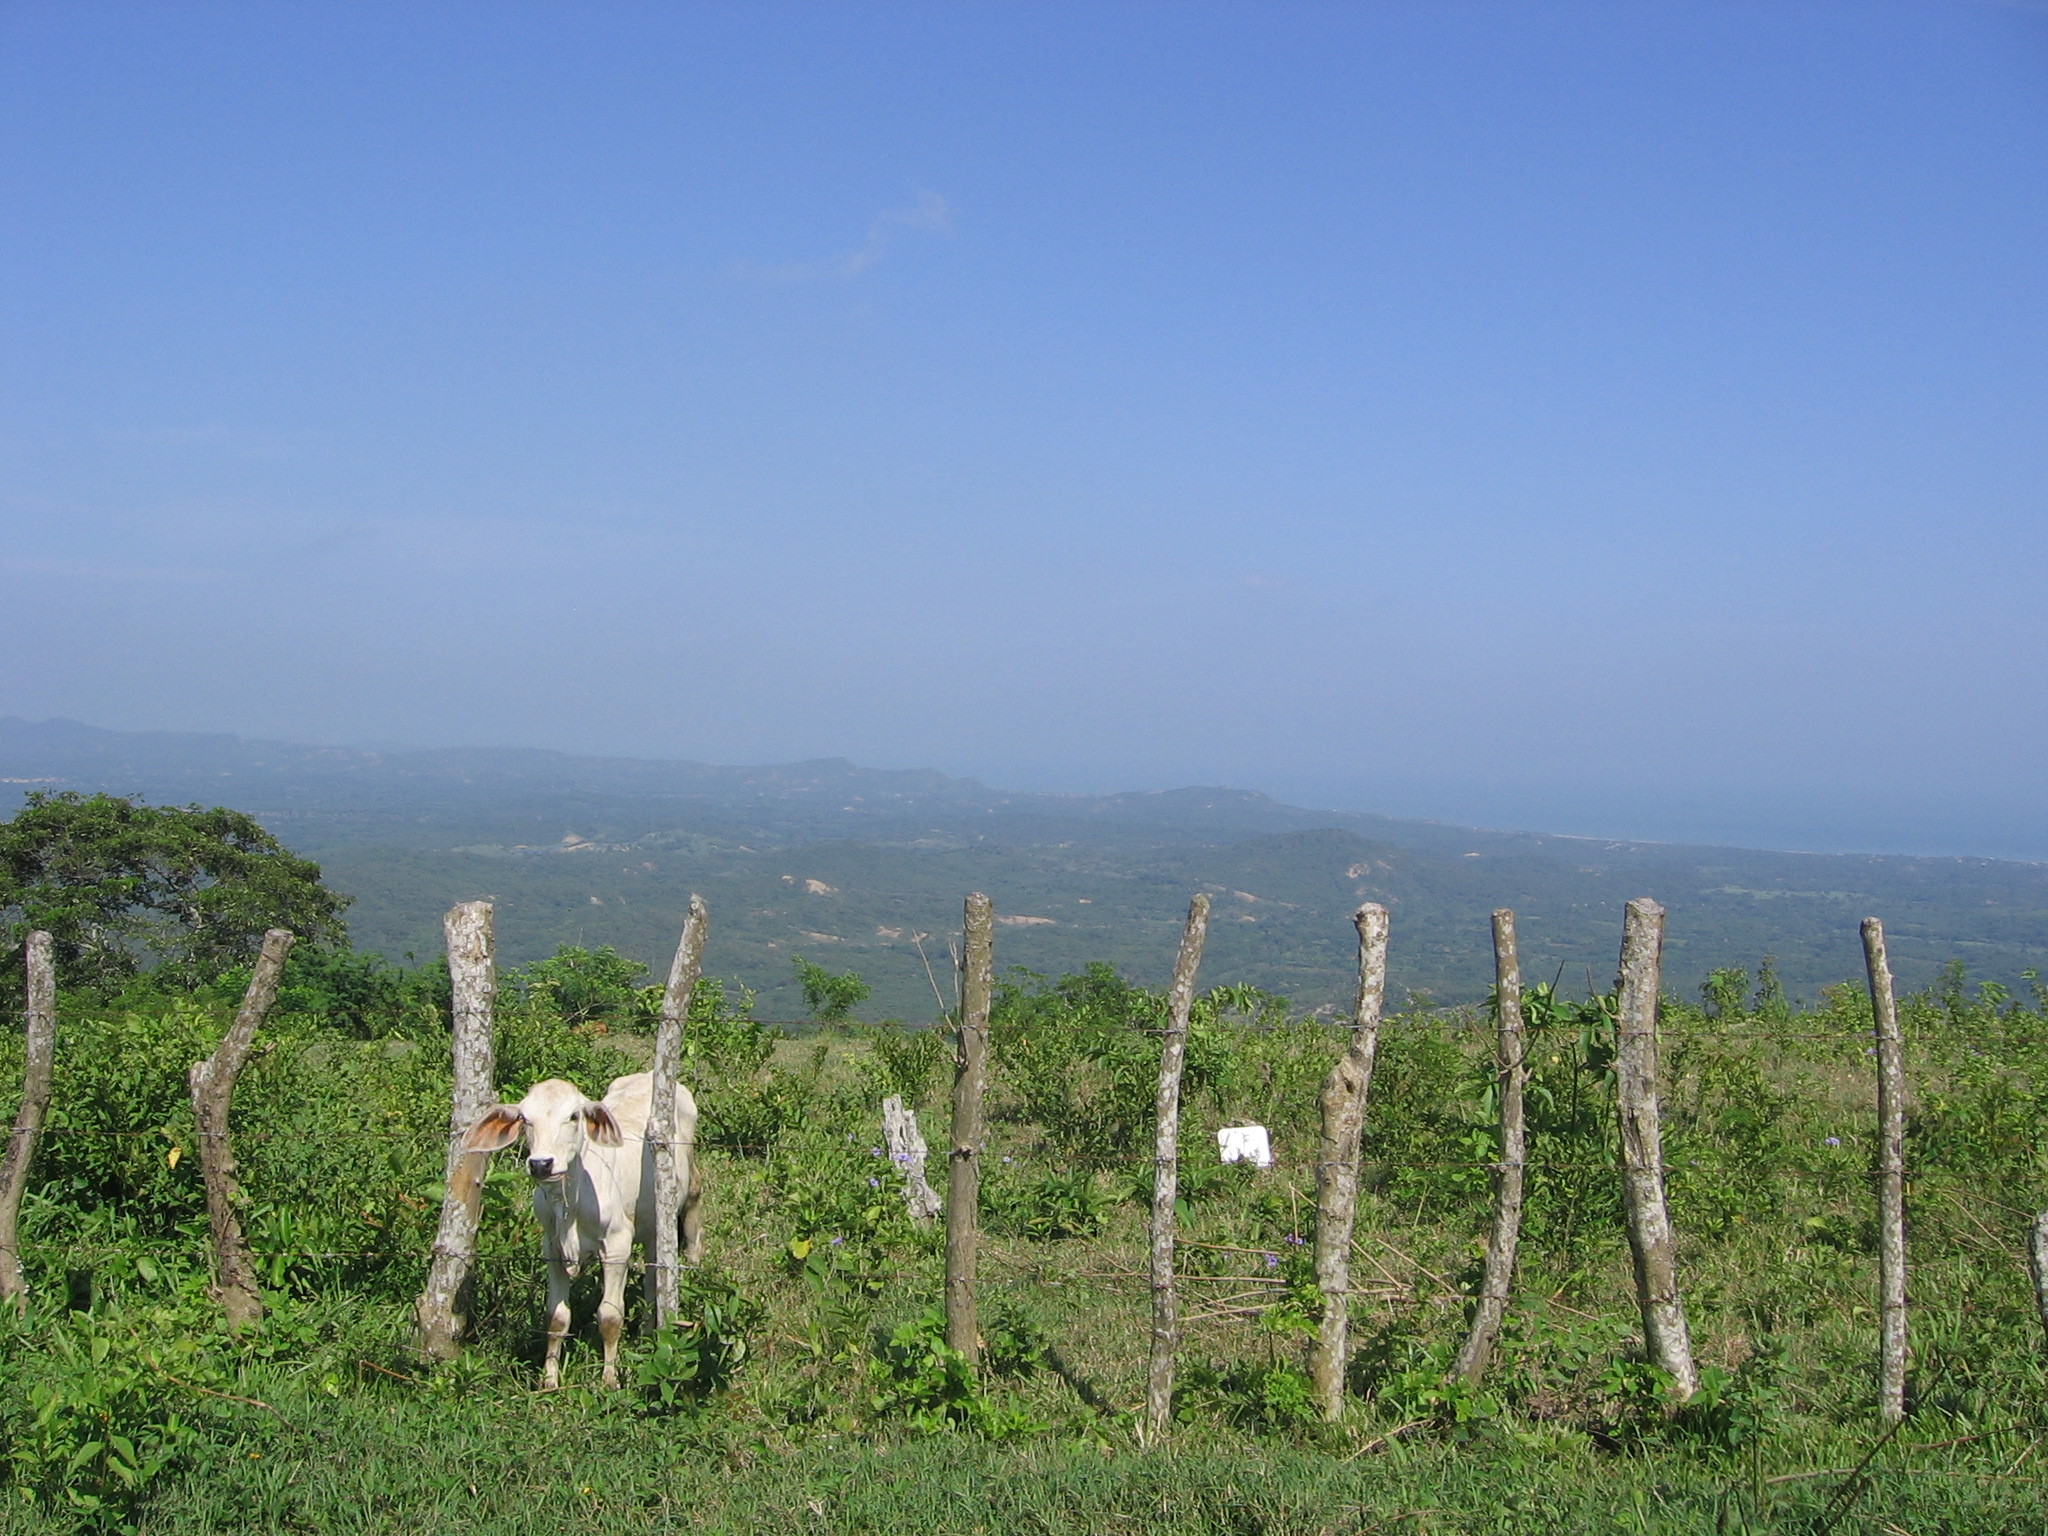 vaca tubara